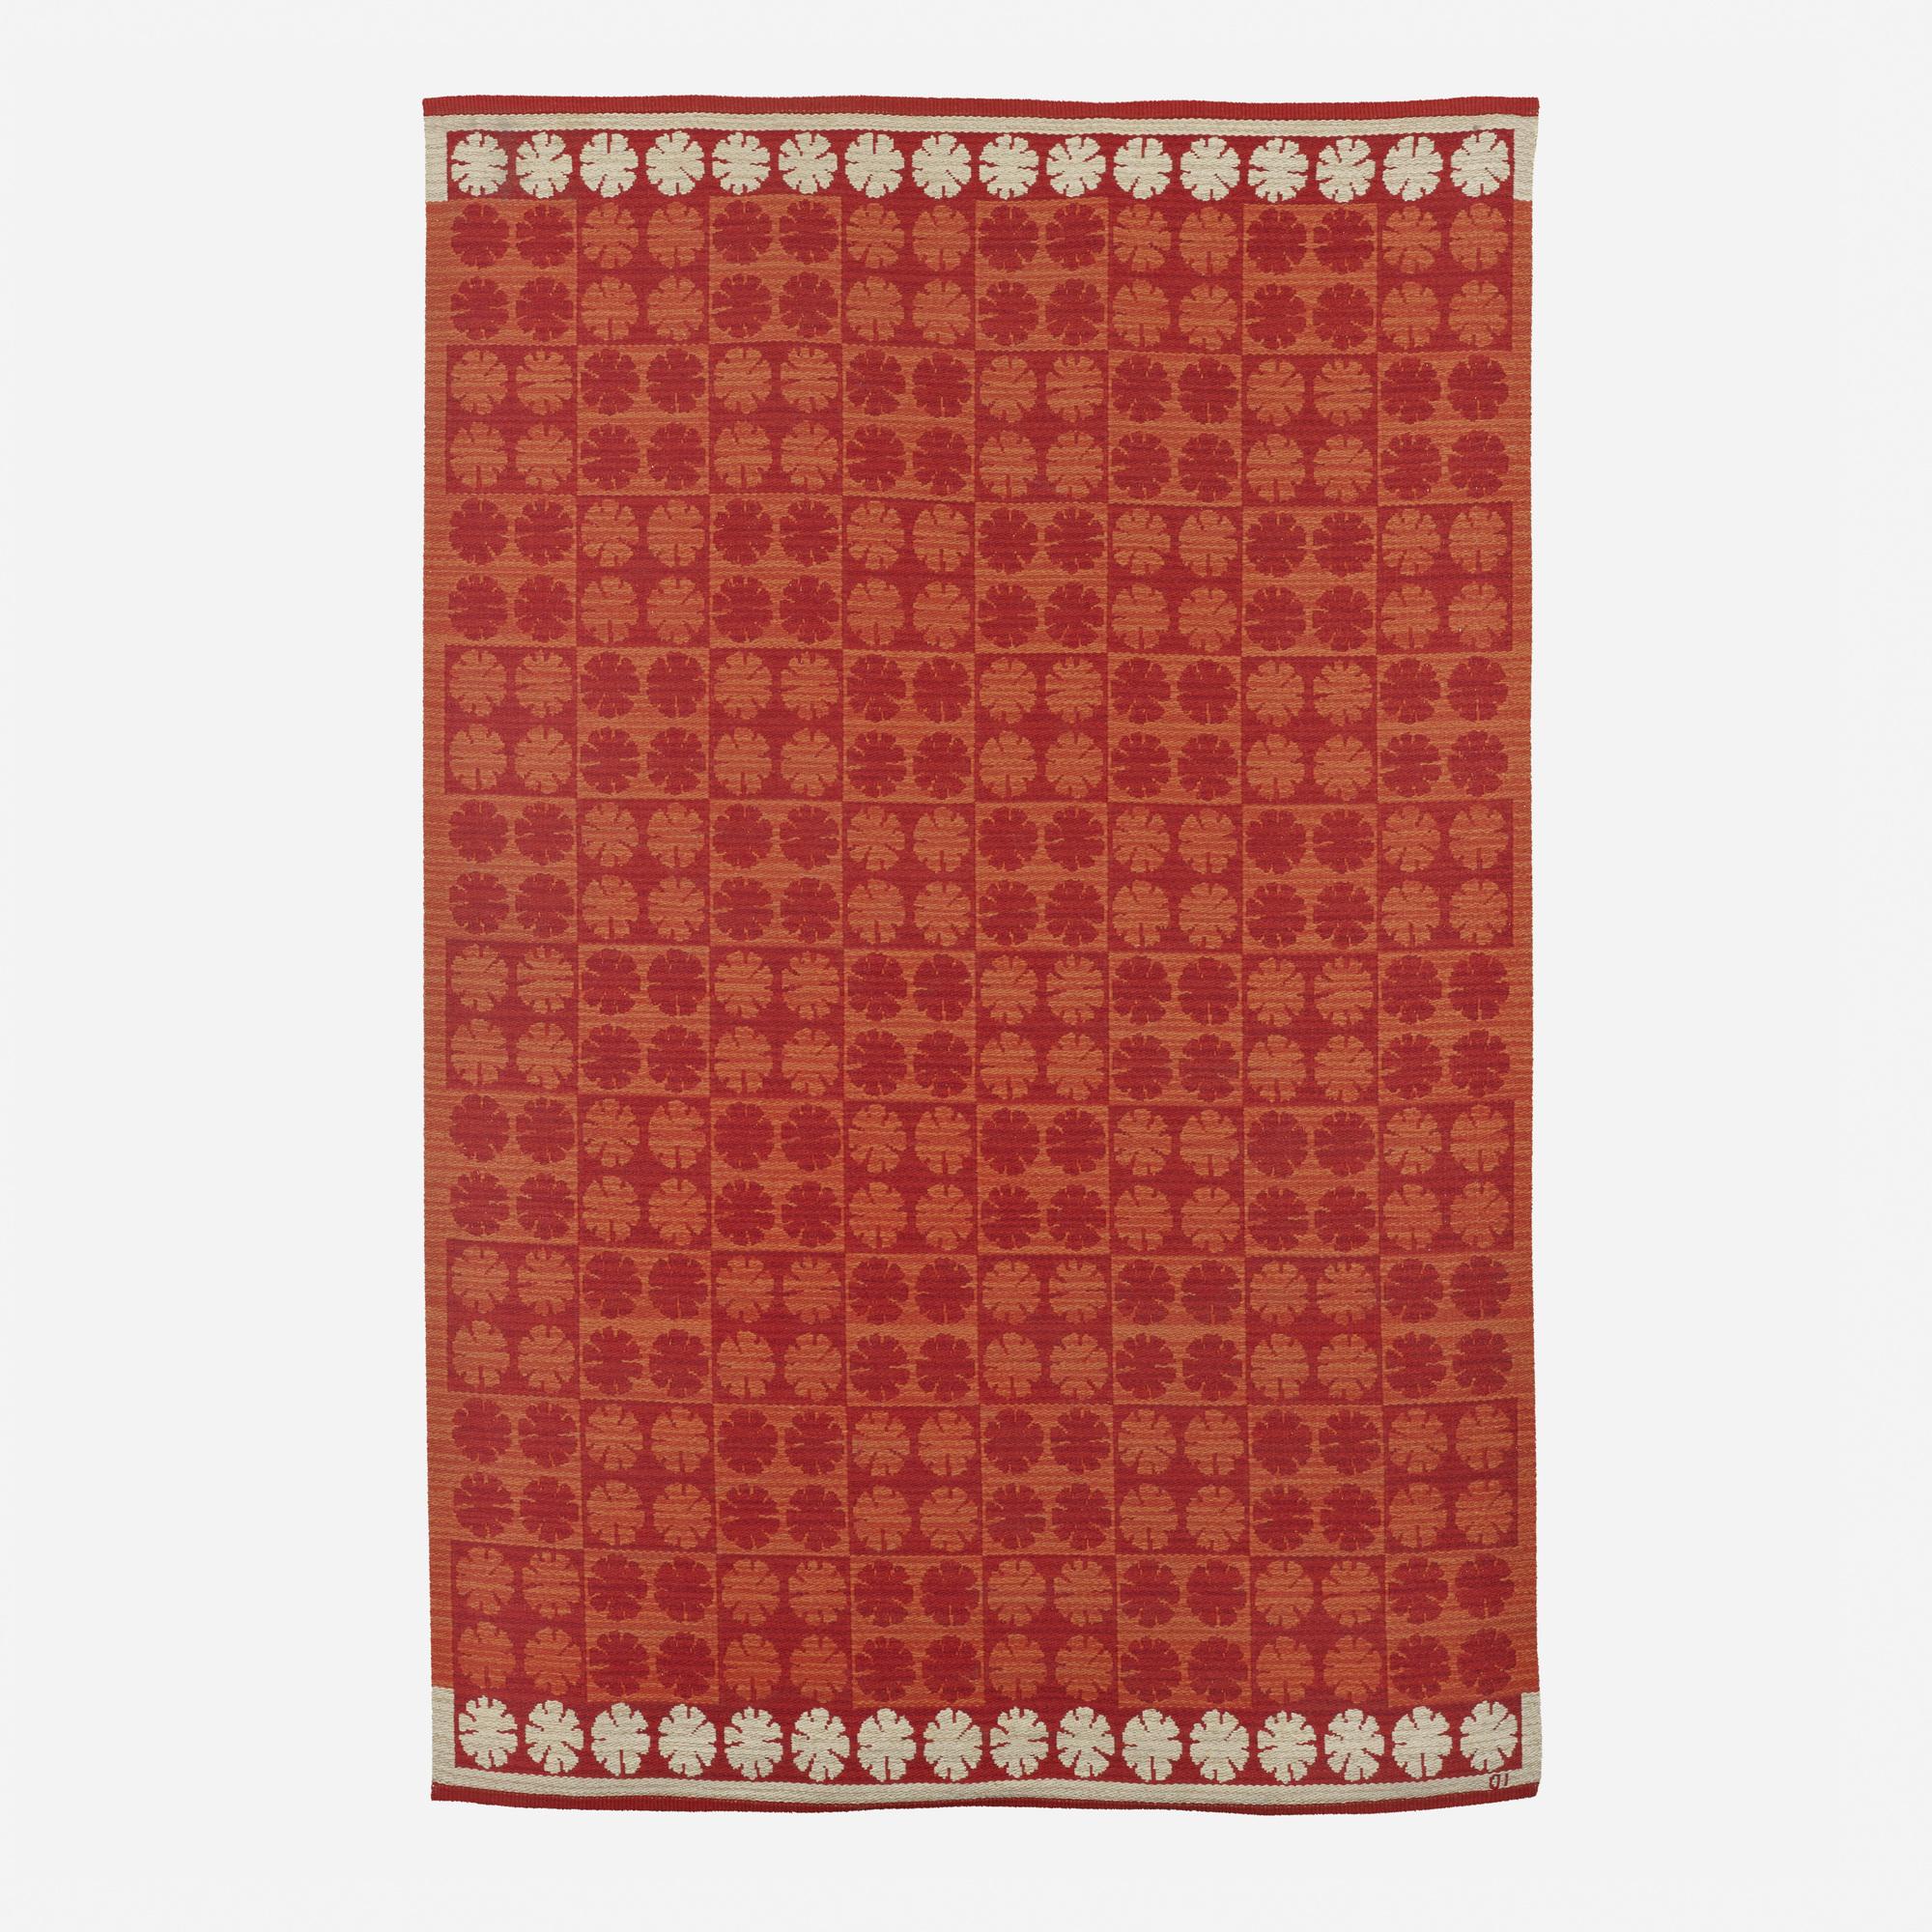 201: Ingrid Dessau / reversible flatweave carpet (2 of 2)